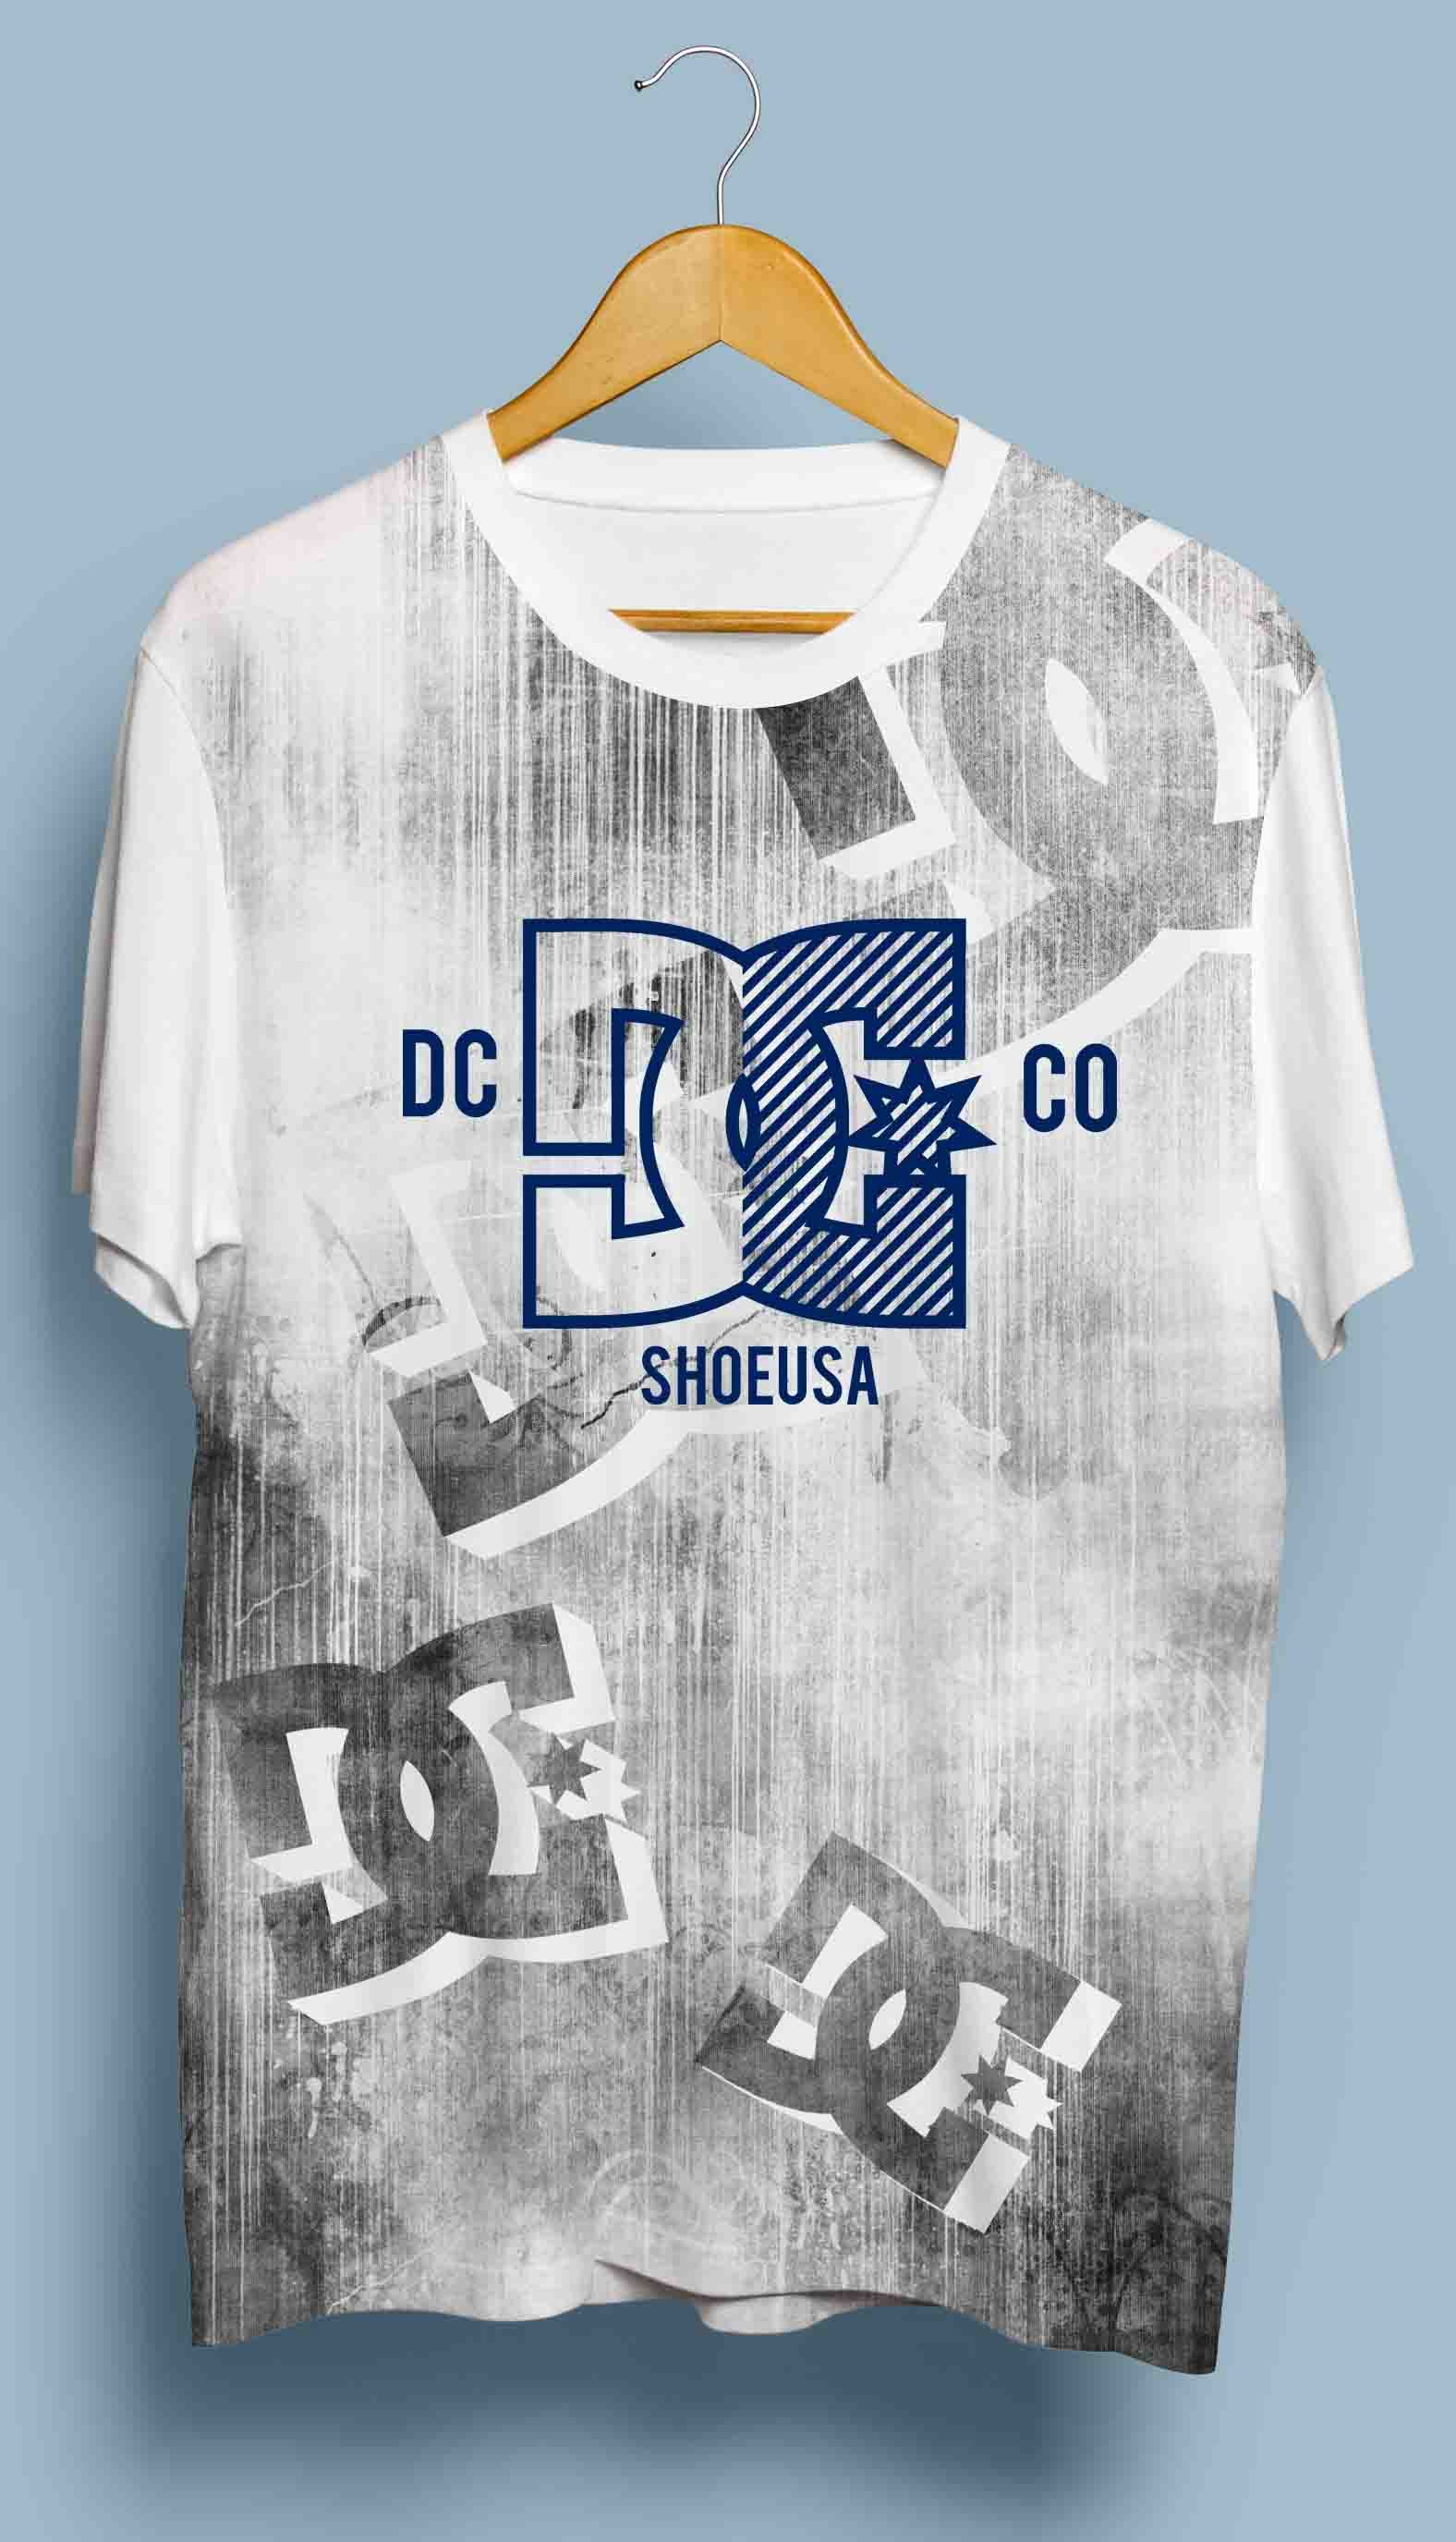 Tees Dc Surf Tees Dc T Shirtdesign Dcshoecousa T Shirtdc